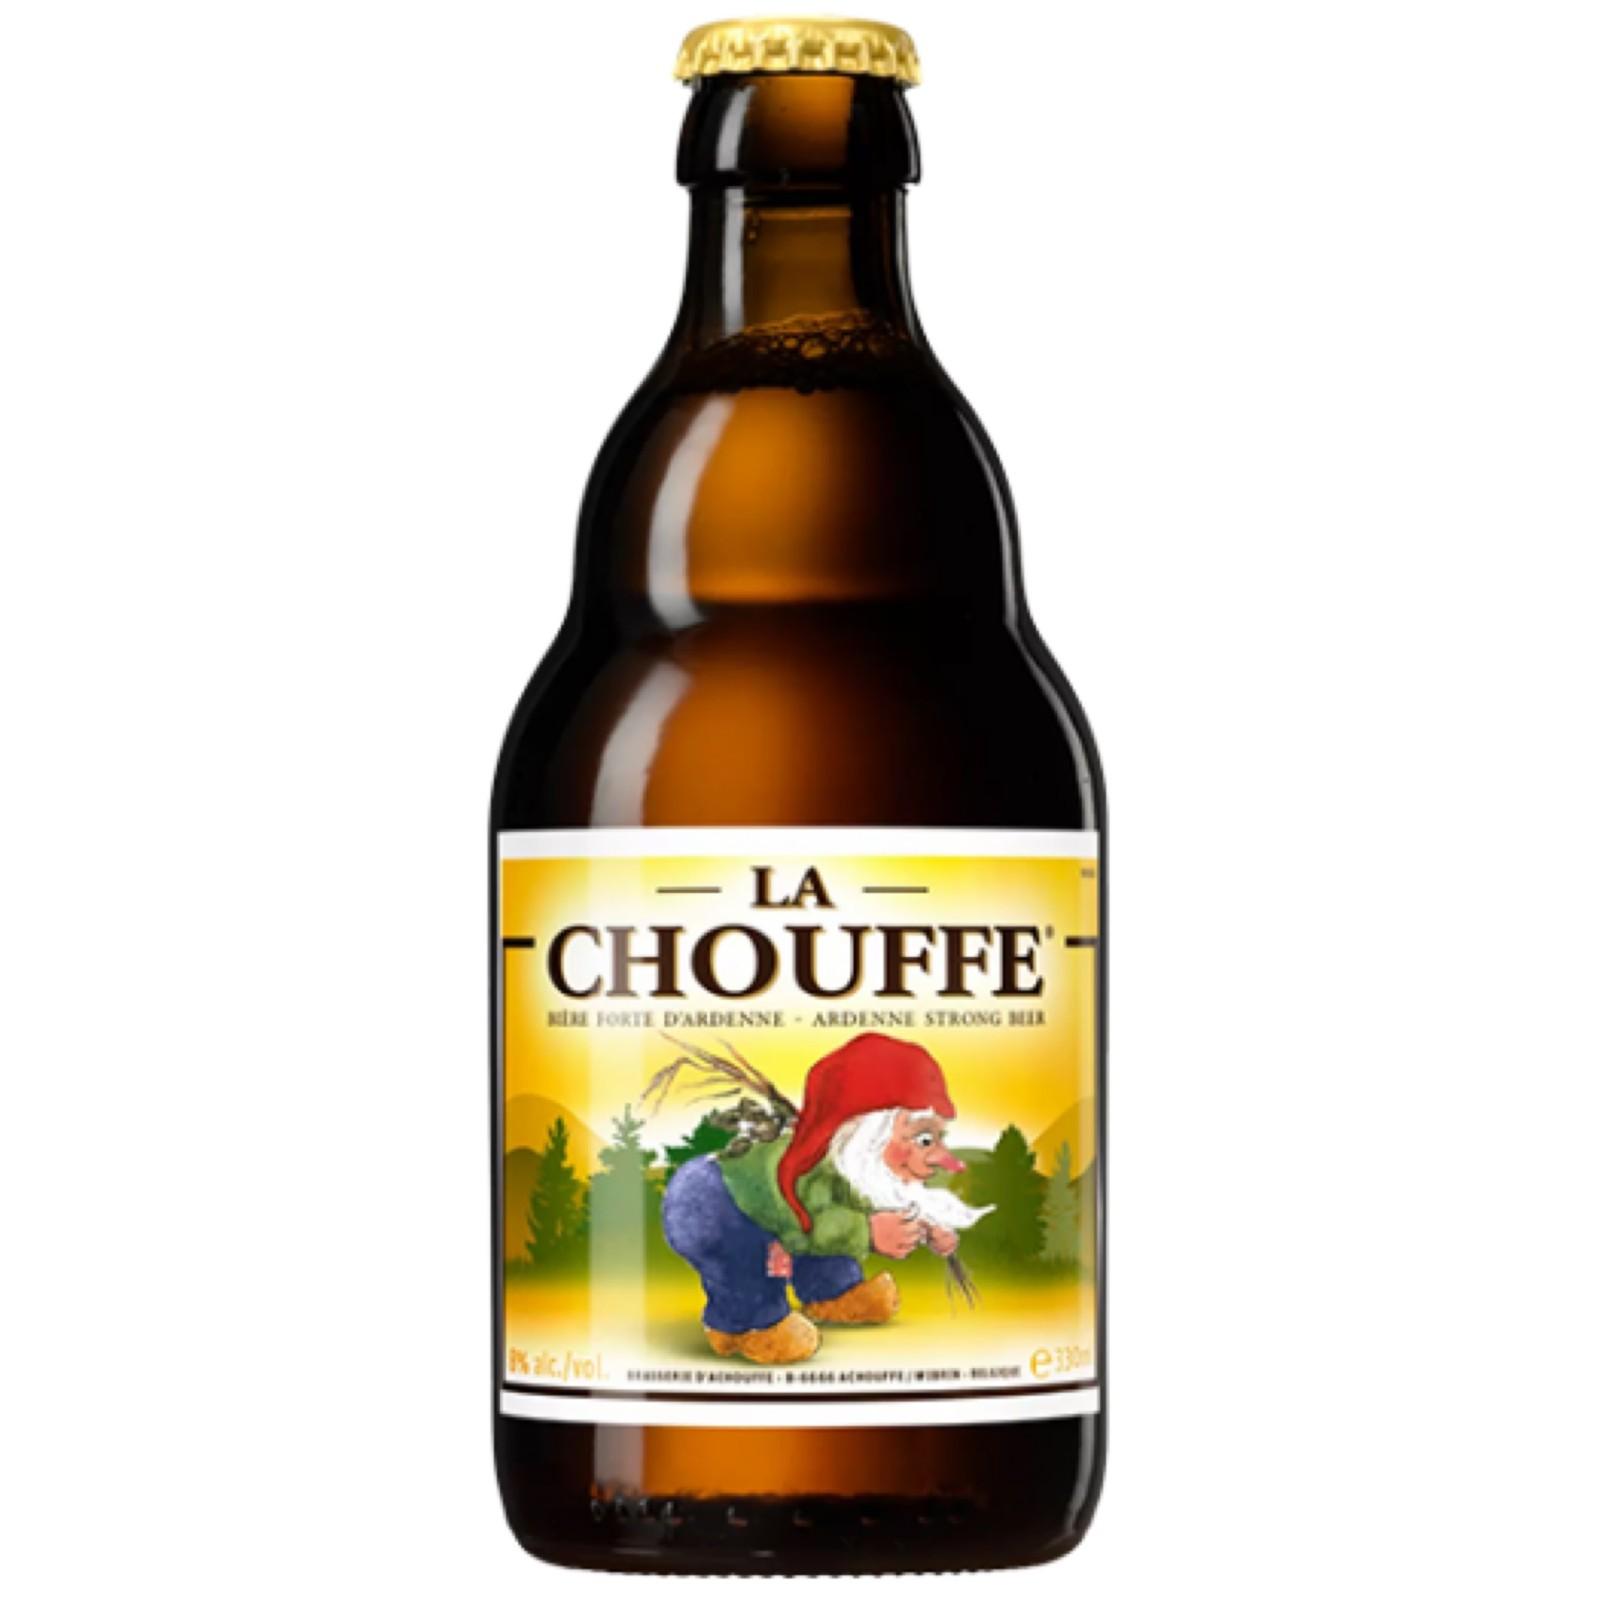 La Chouffe Blonde Saison 8% 330ml Brasserie d'Achouffe